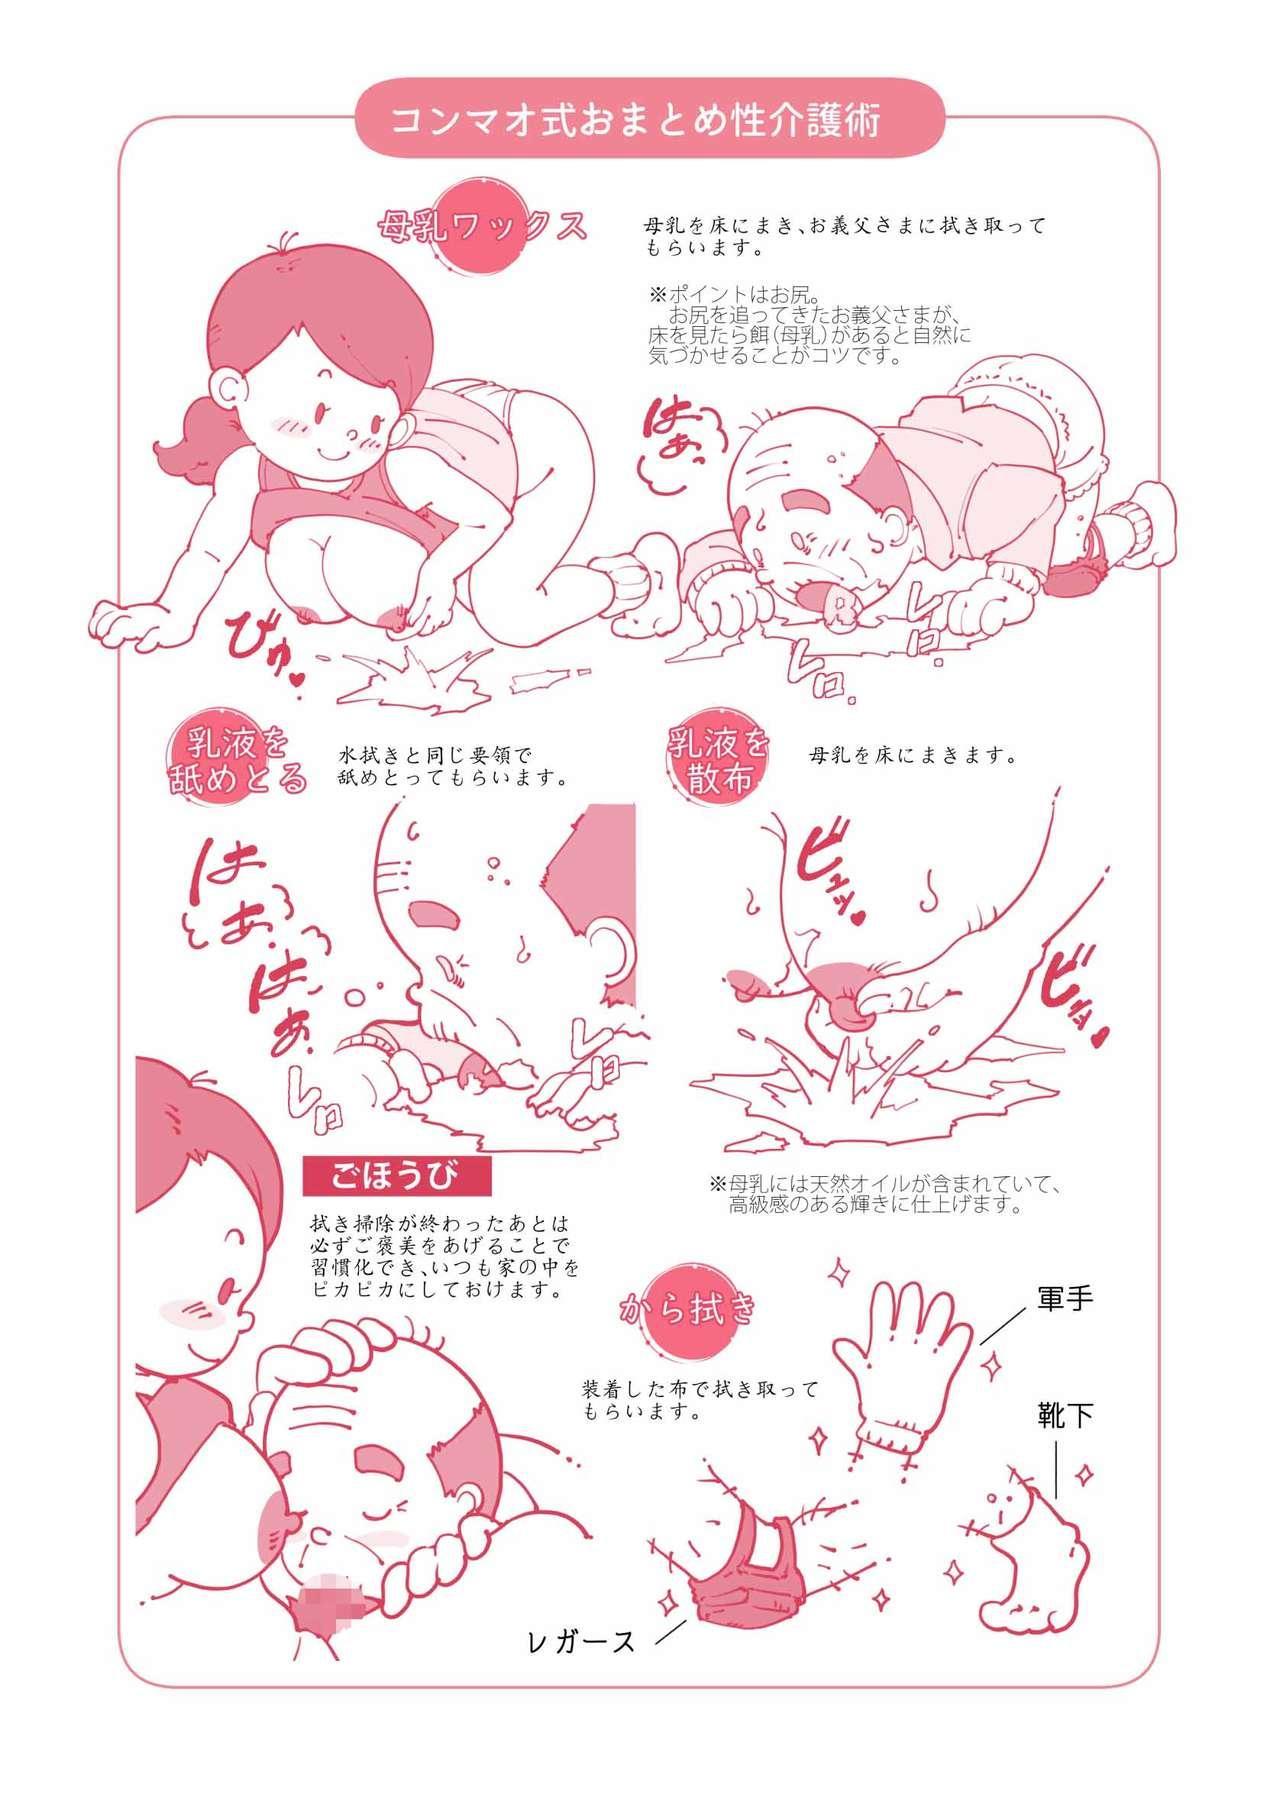 Isogasii Okaasan No Tamuno Sasa Rouzin Seikaigo | Guide for Elderly Sex Health Care to Busy Mom 22